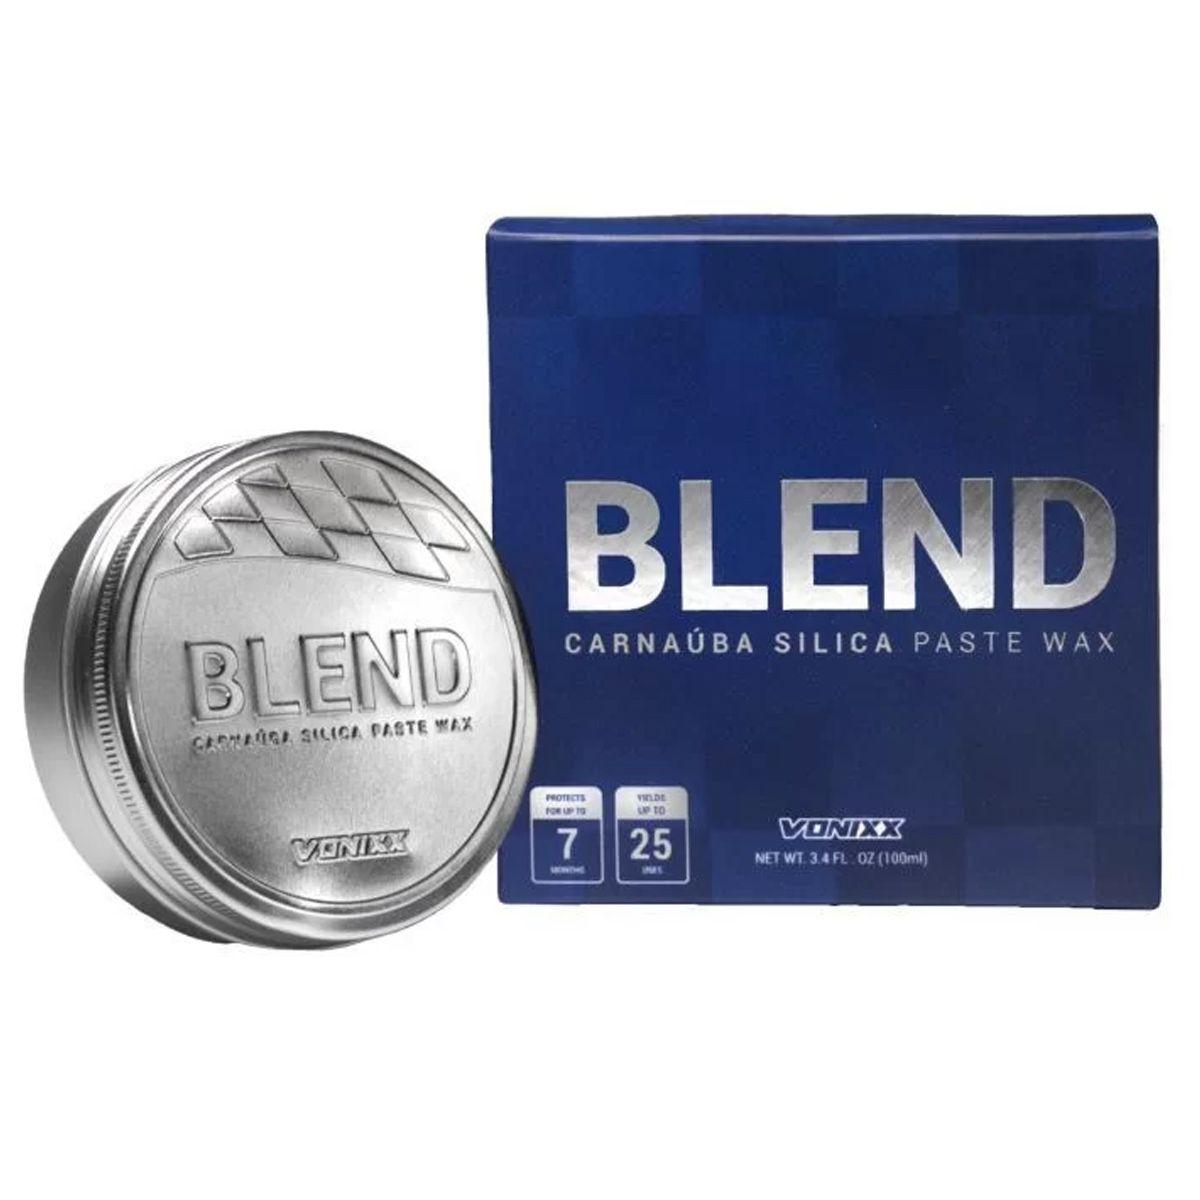 Kit Blend Paste Wax 100ml + V-bar 100g Vonixx